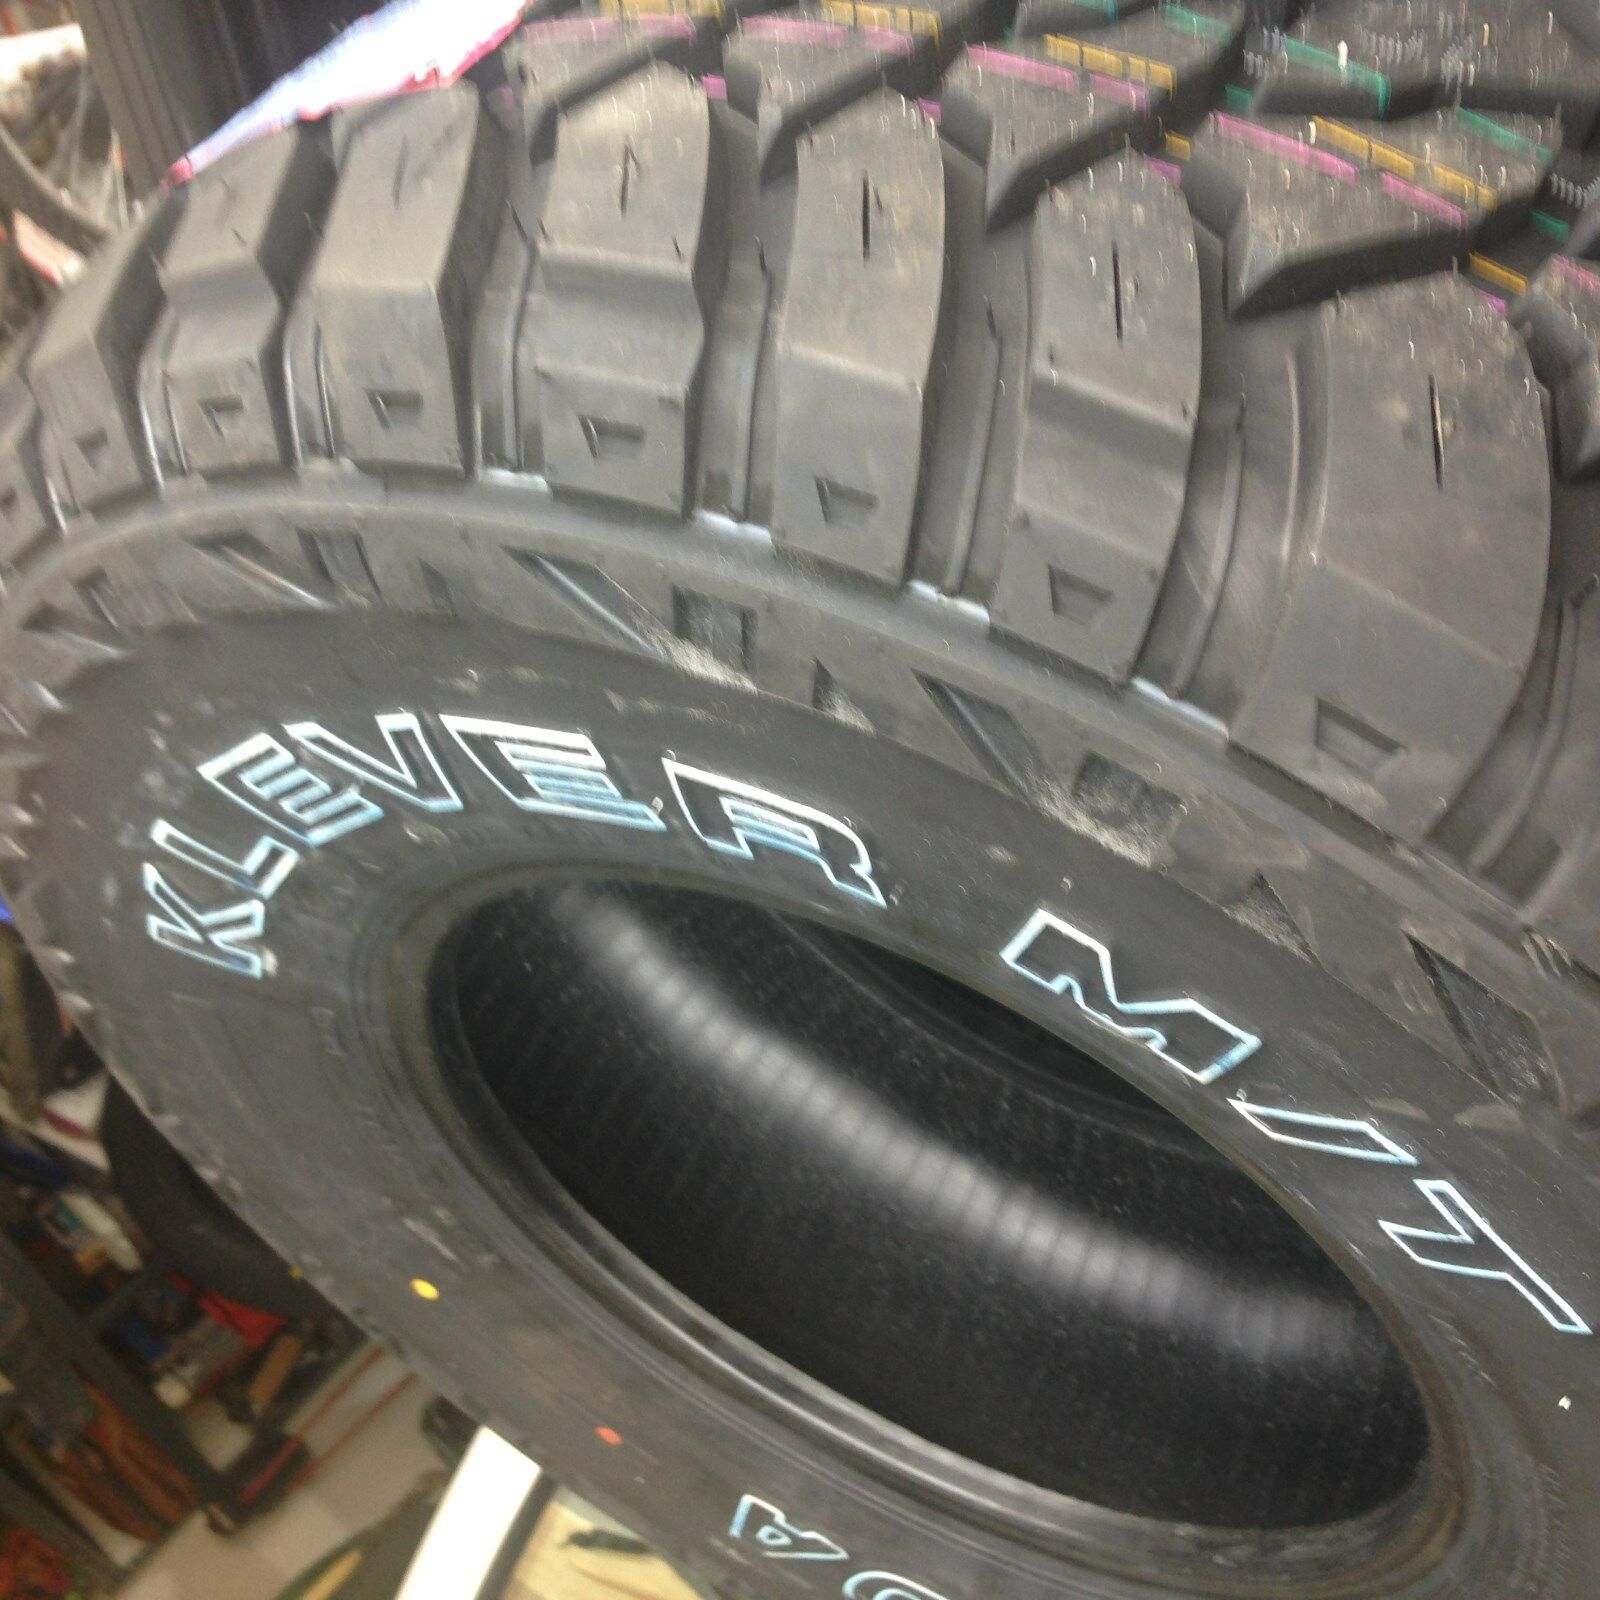 4 33x12 50r15 KENDA Klever M t Kr29 Mud Tires 33 12 50 15 1250 R15